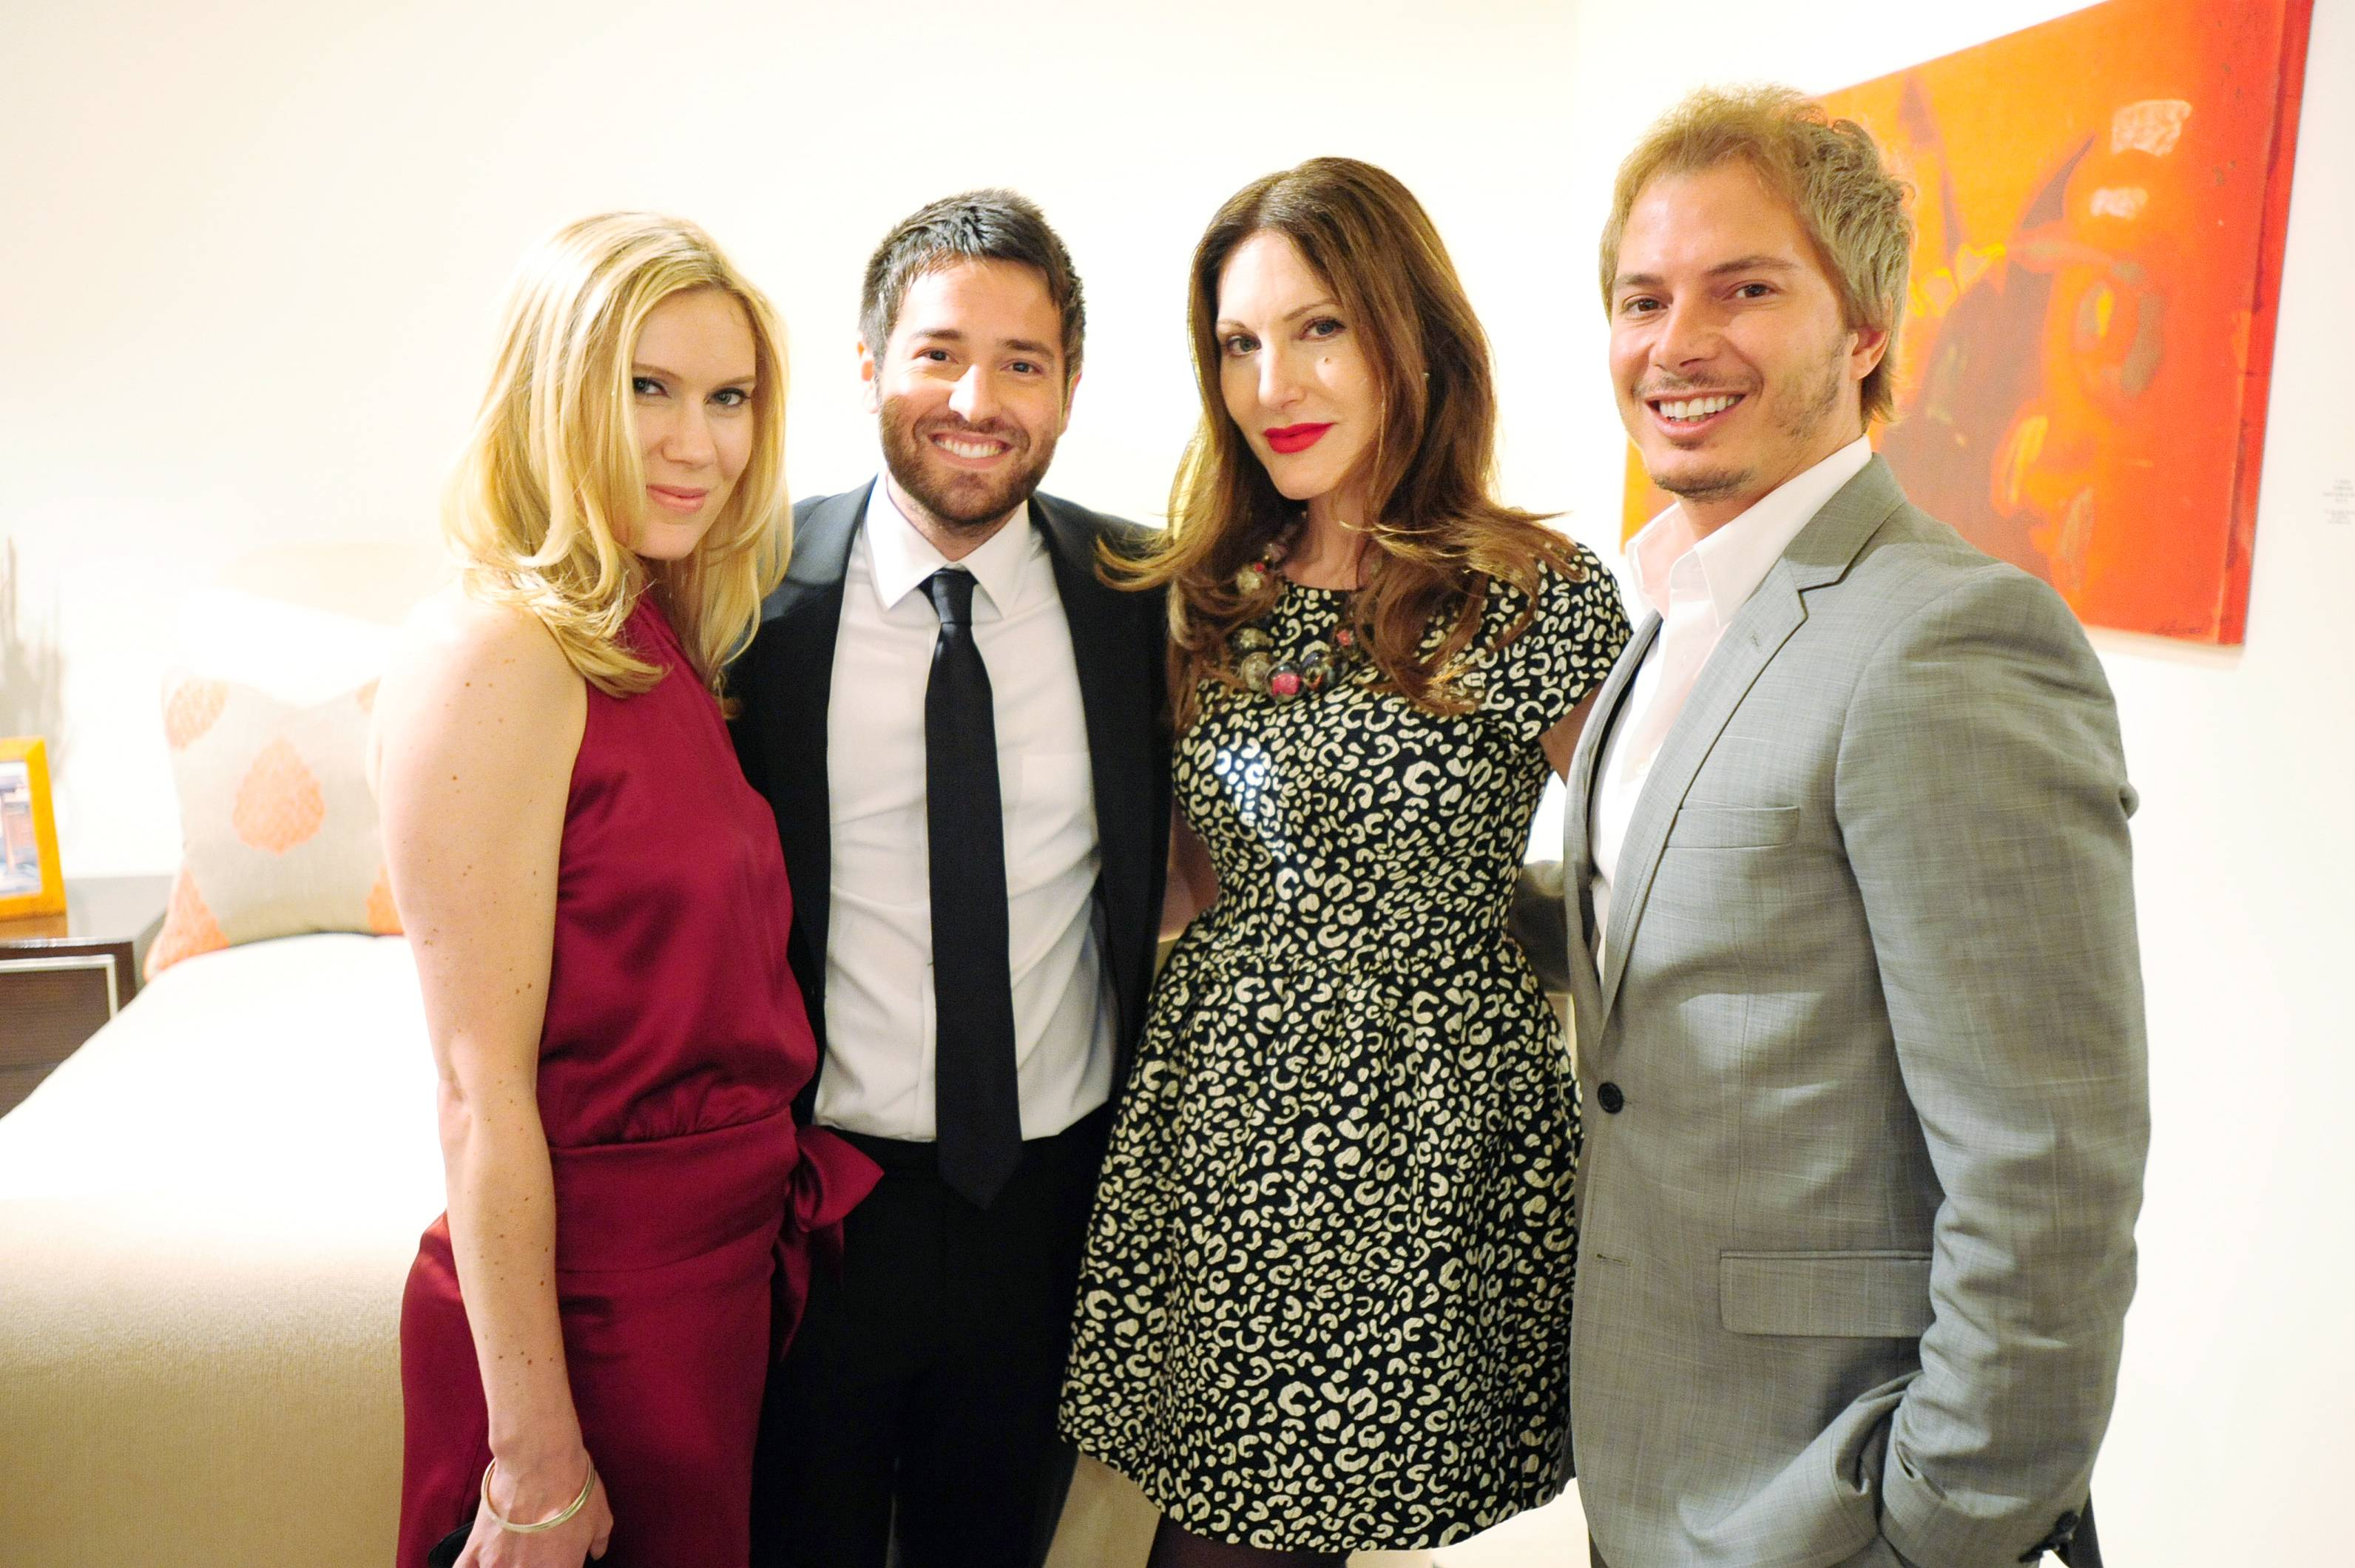 Kate & Loren Kreiss, Tara Solomon, & Nick D'Annunzio2